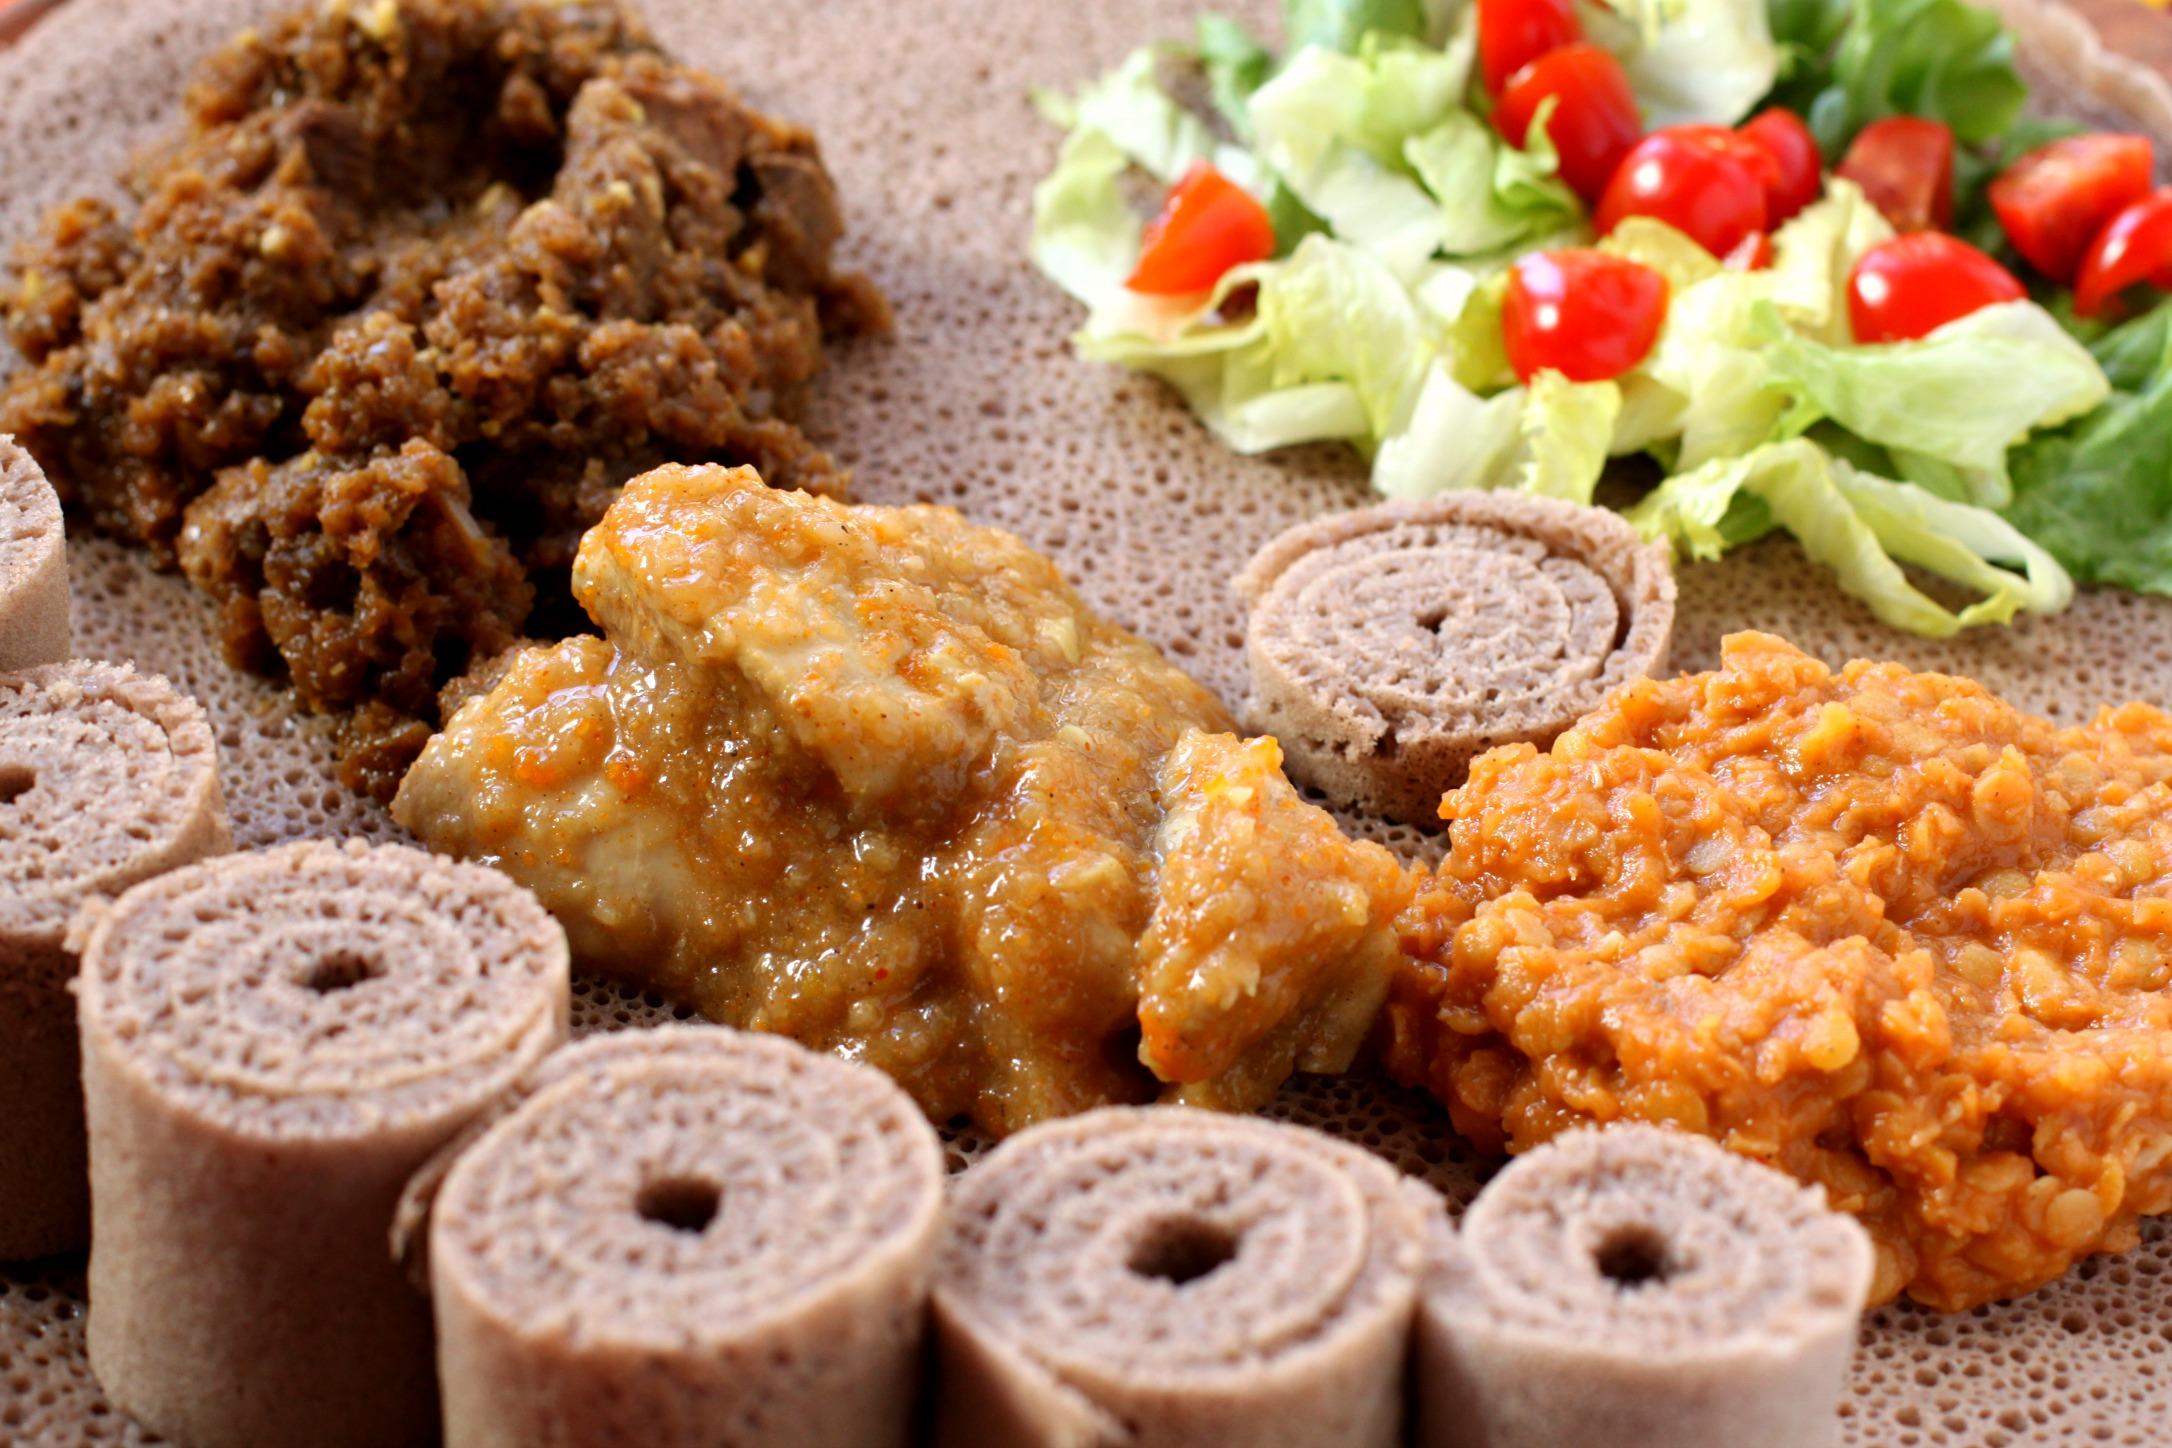 Around the World in Twelve Plates - Ethiopia - Dish 'n' the Kitchen